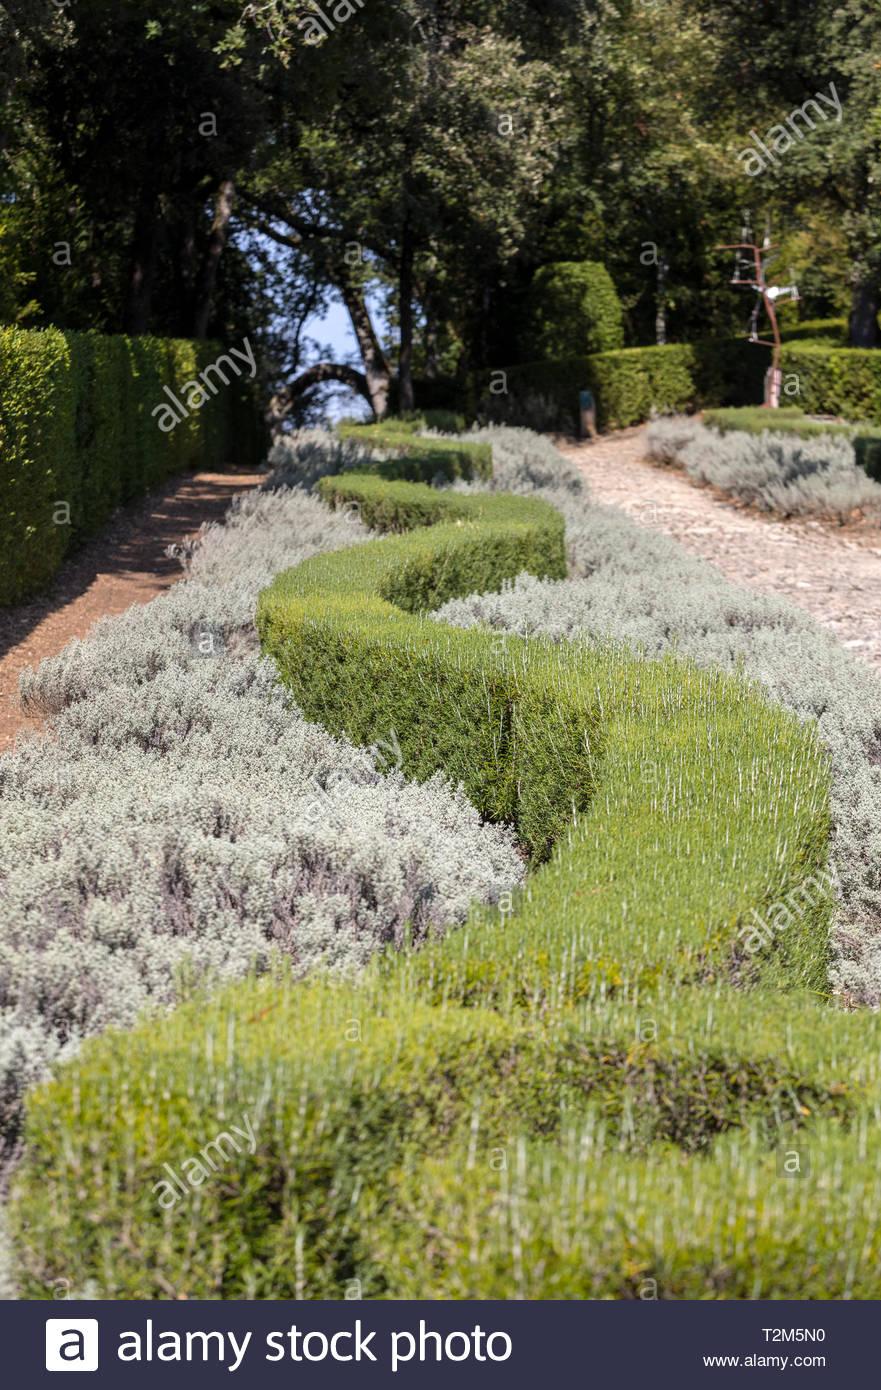 the gardens of the jardins de marqueyssac in the dordogne region of france T2M5N0